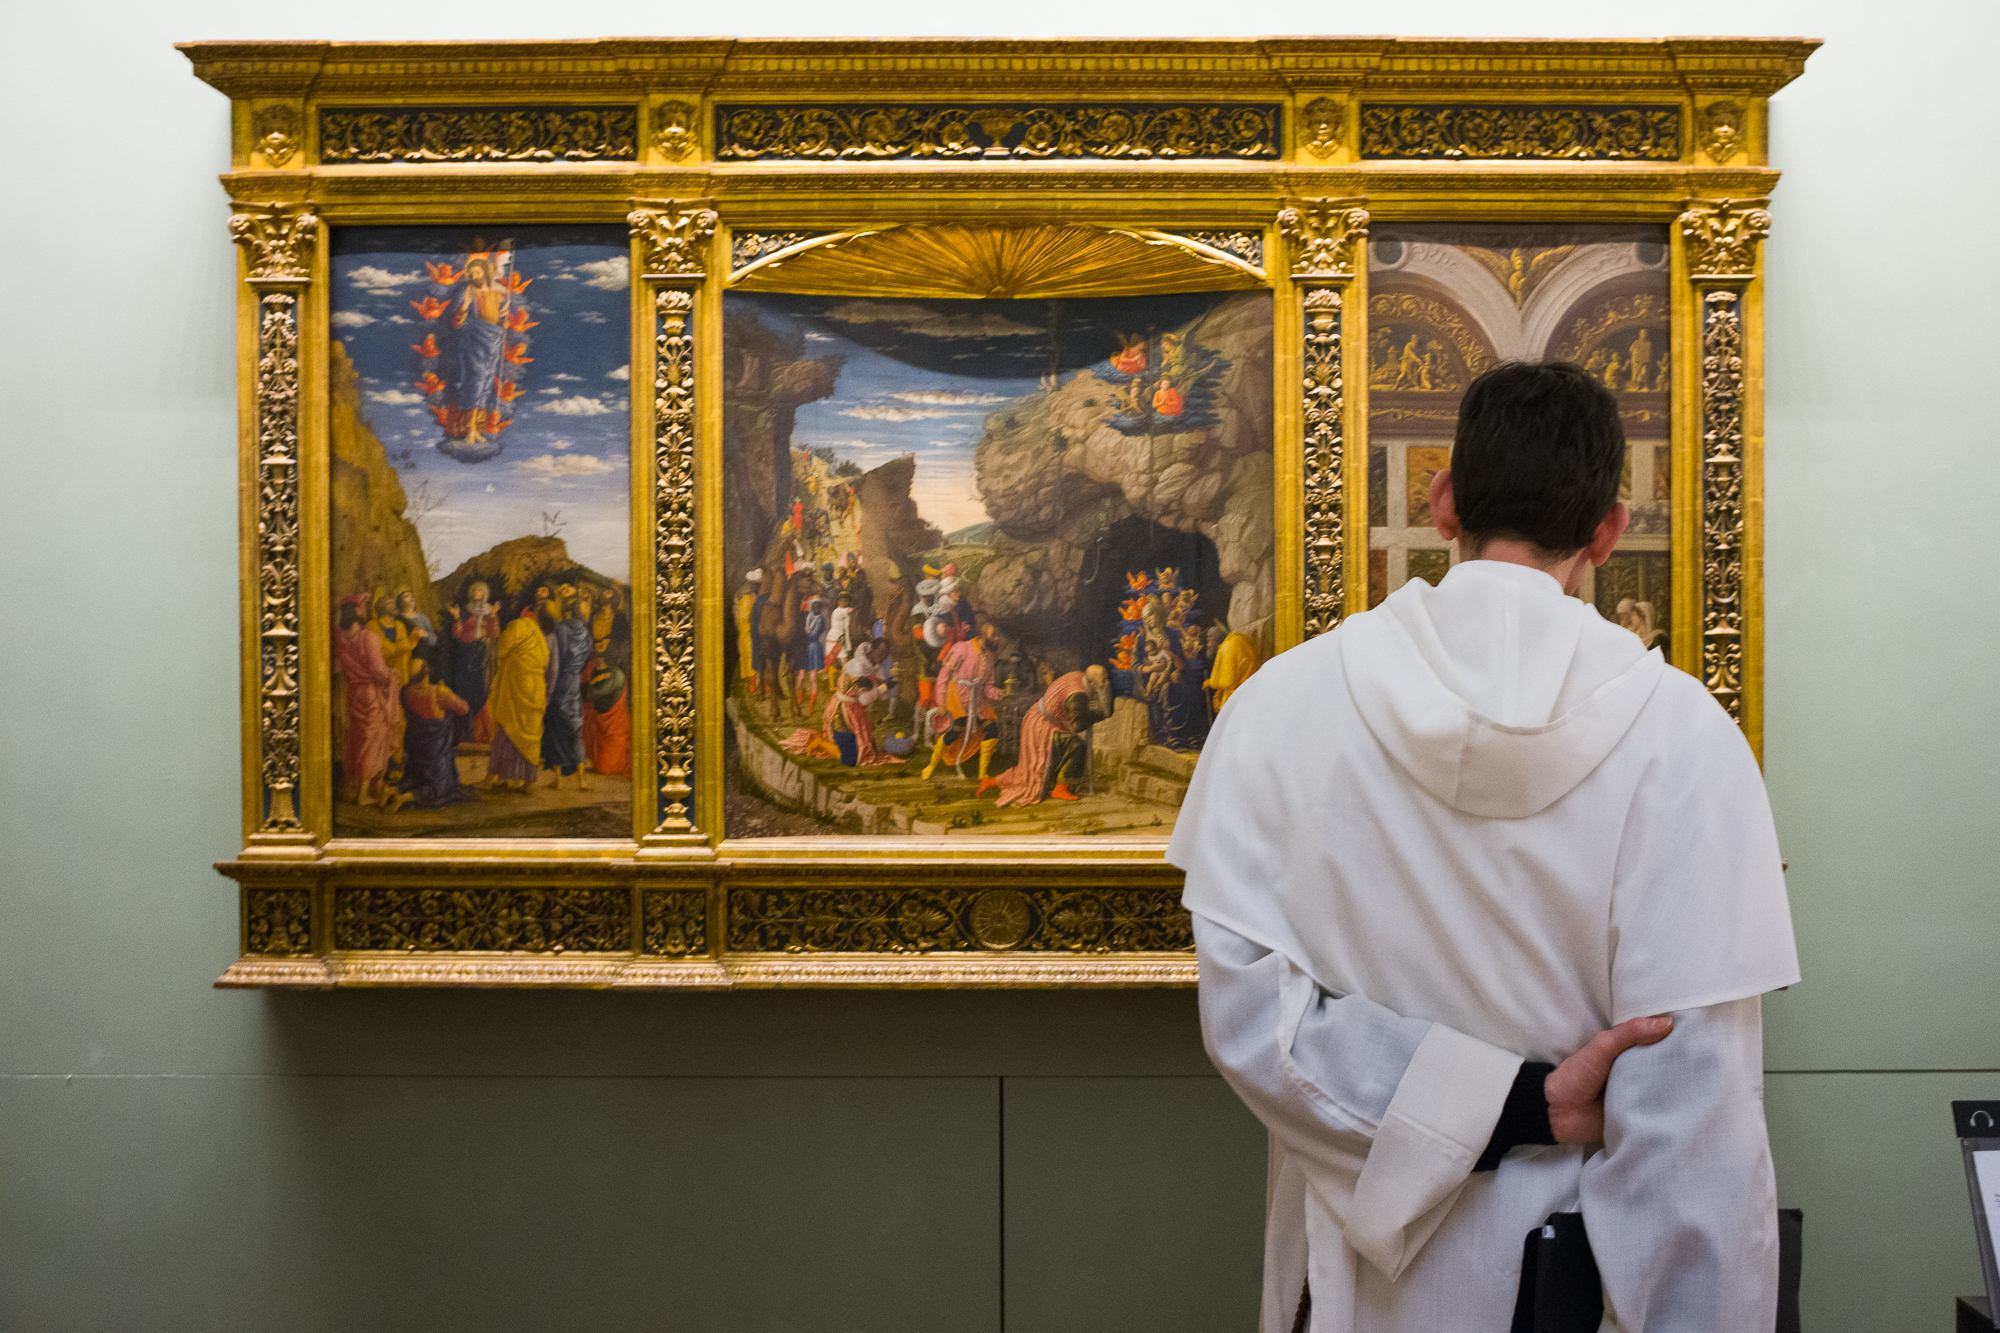 Priest at the Uffizi